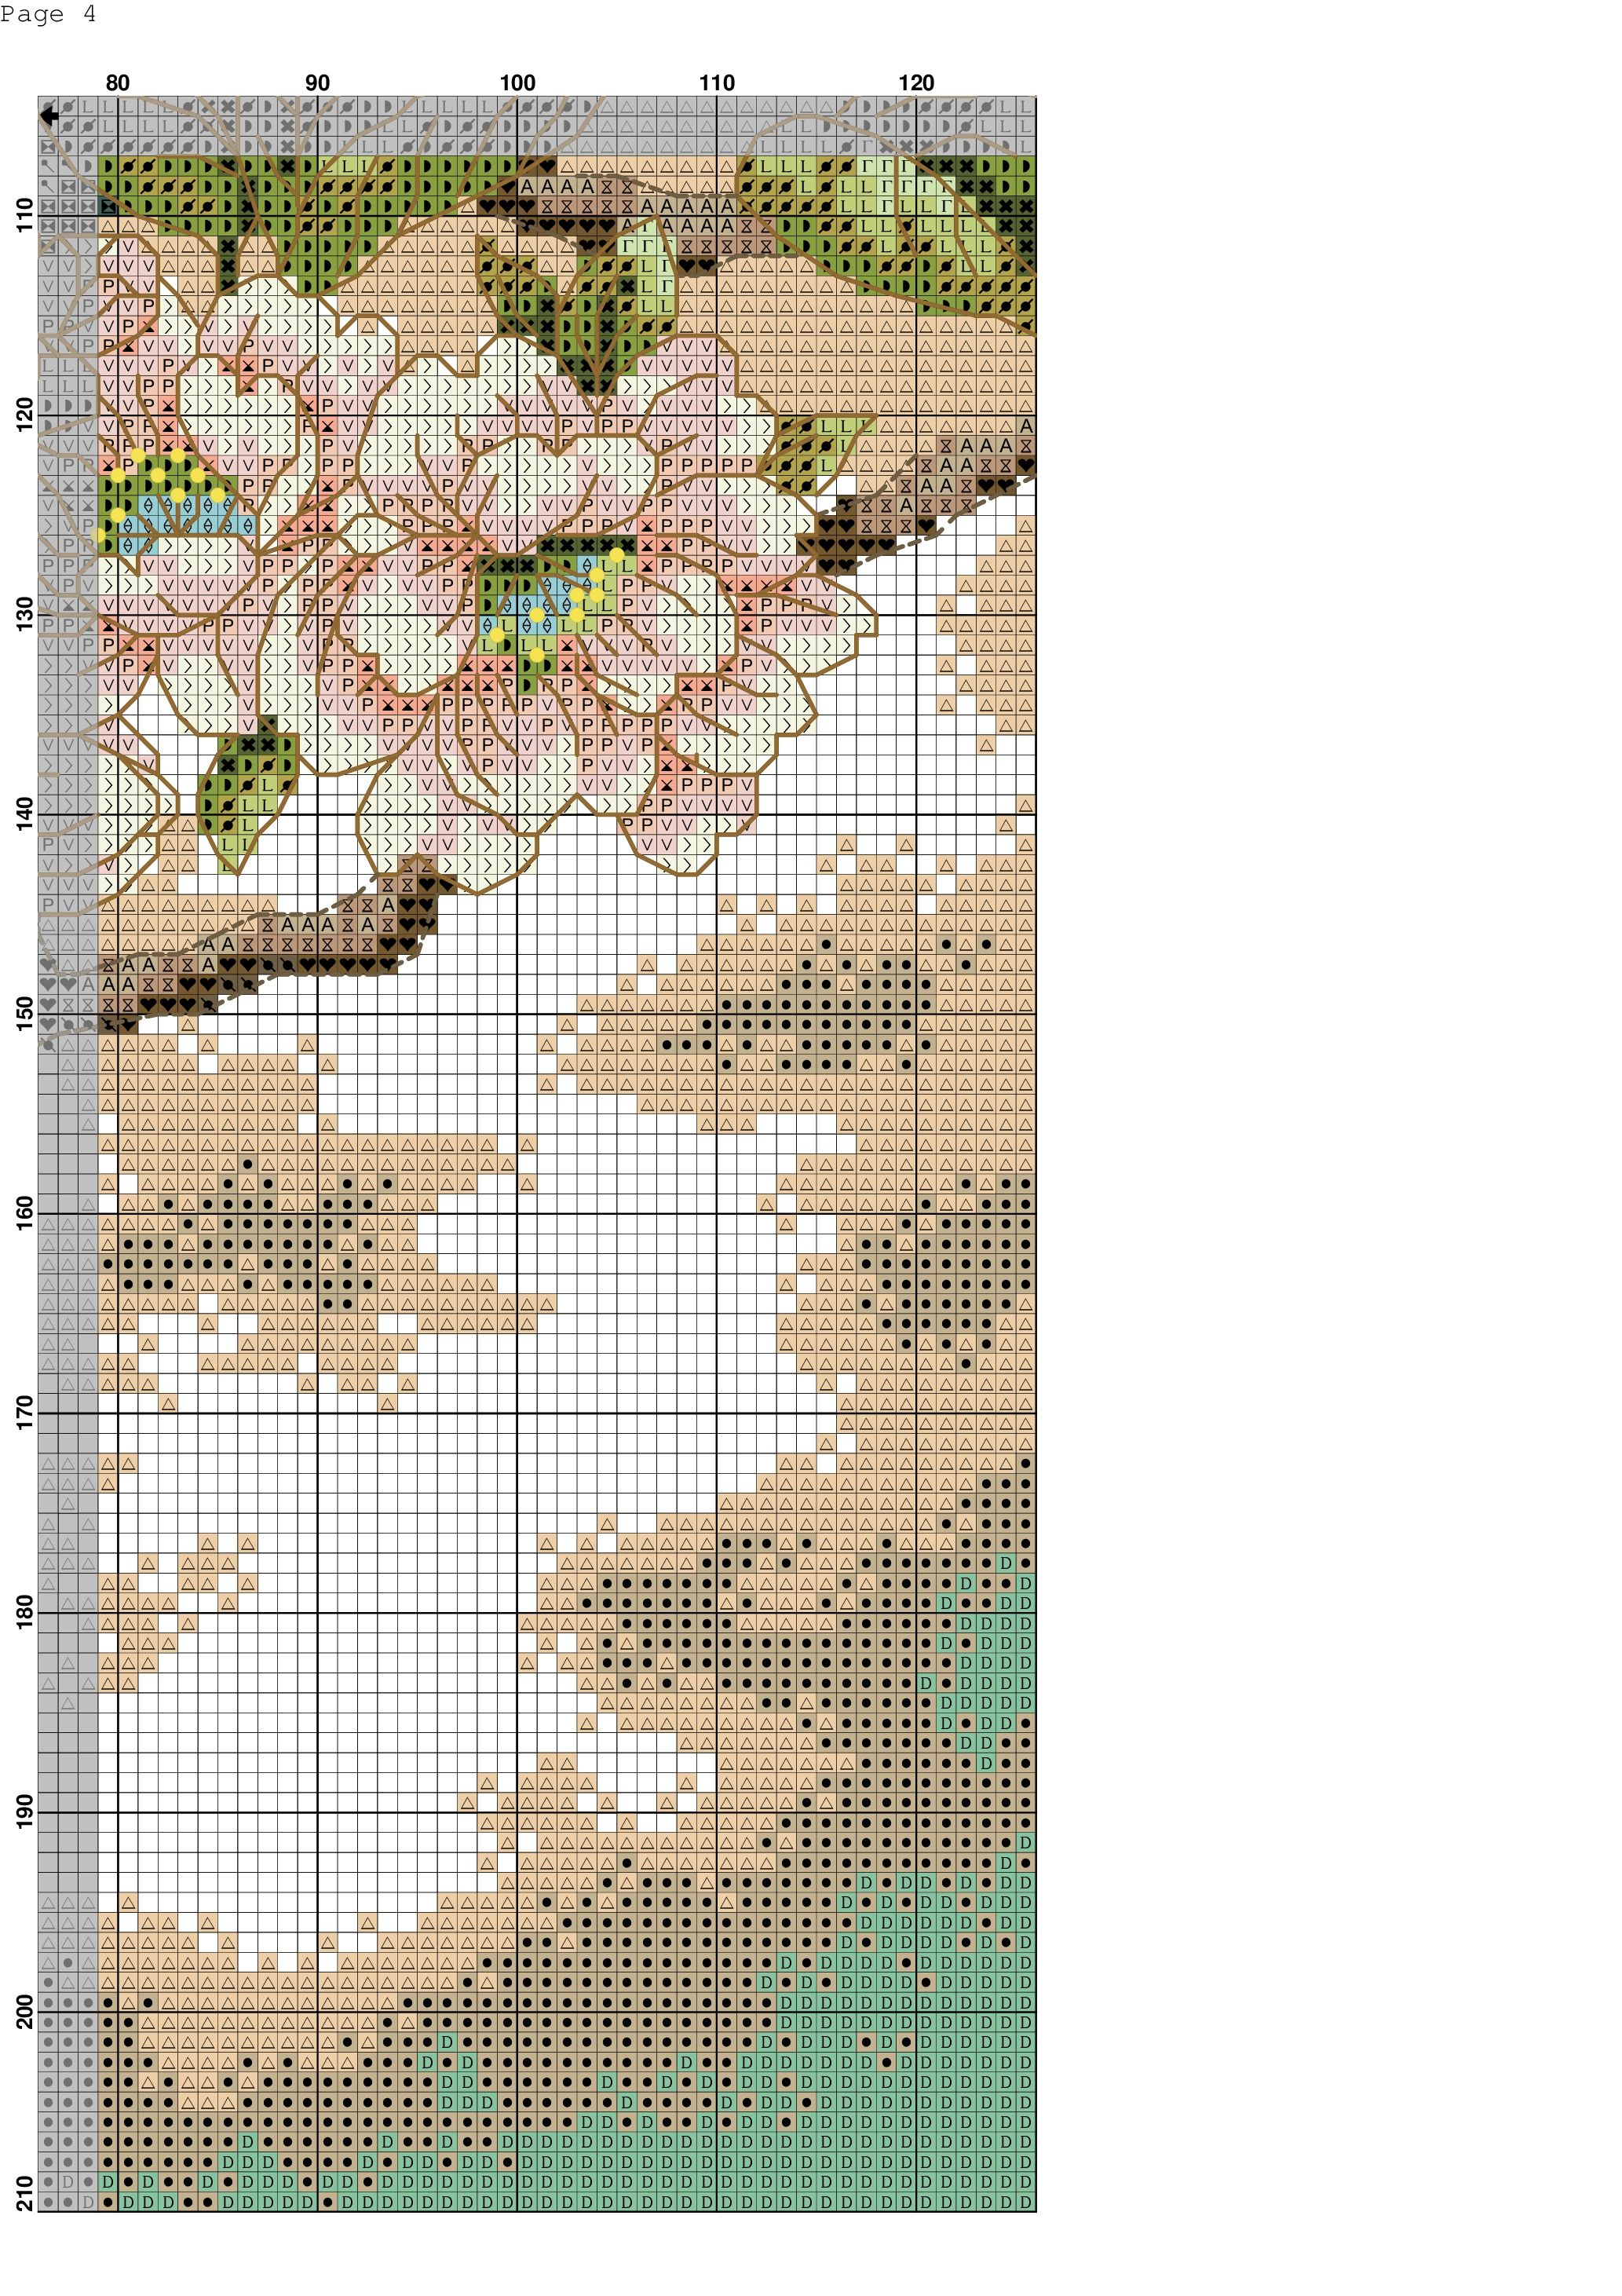 Pin de Xuan_Loc Pham_Thi en Tranh chim - bướm | Pinterest | Punto de ...